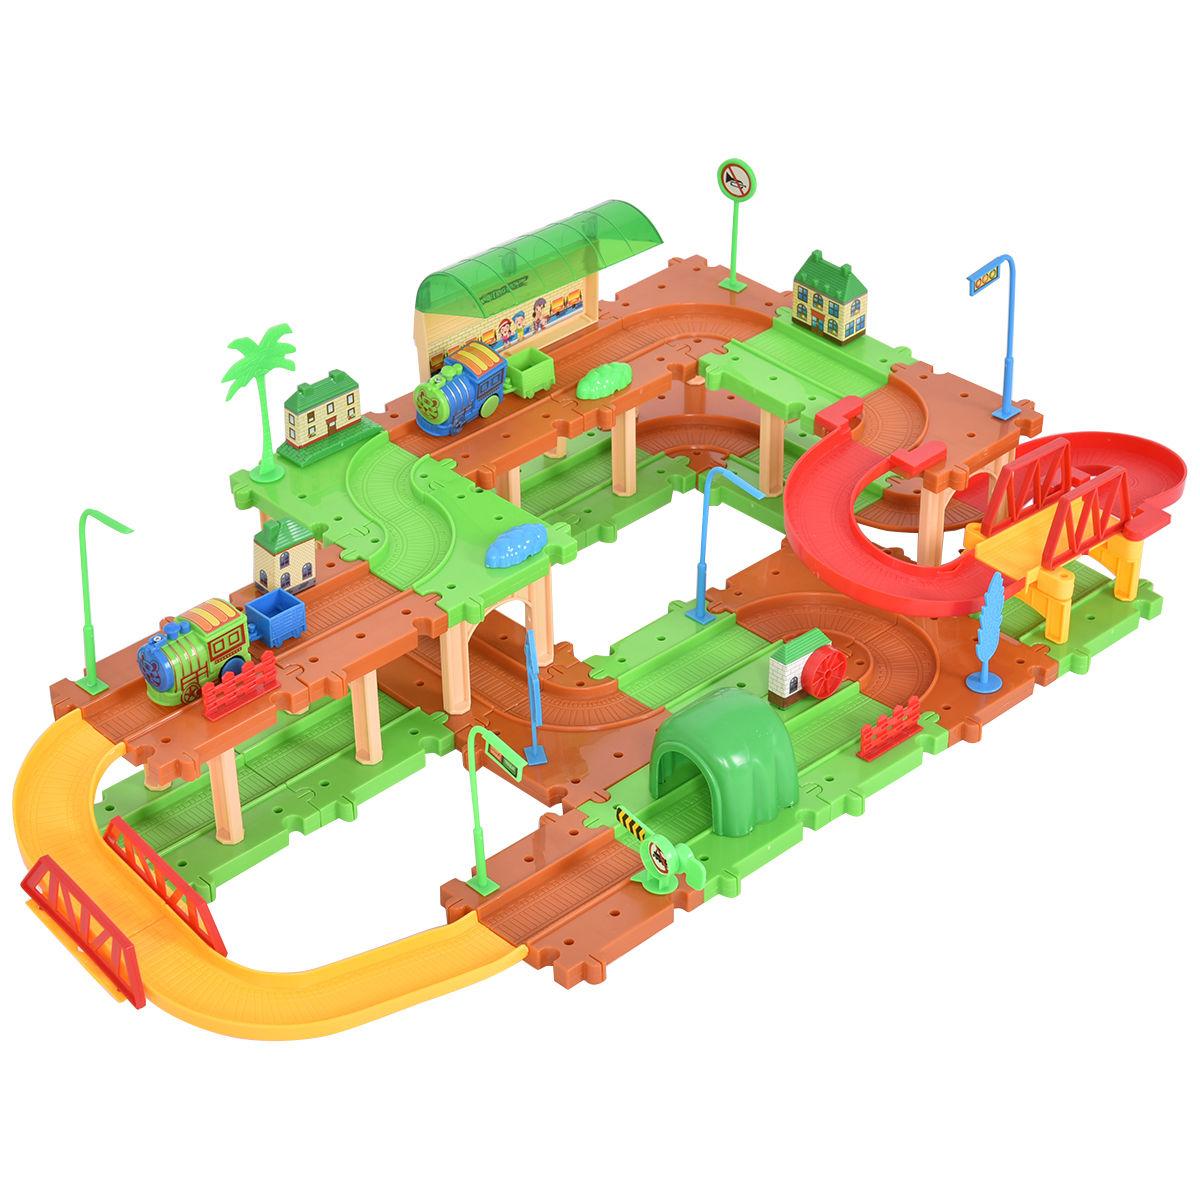 Kids Child Plastic Brick Toys Electronic Building Blocks Railway Train